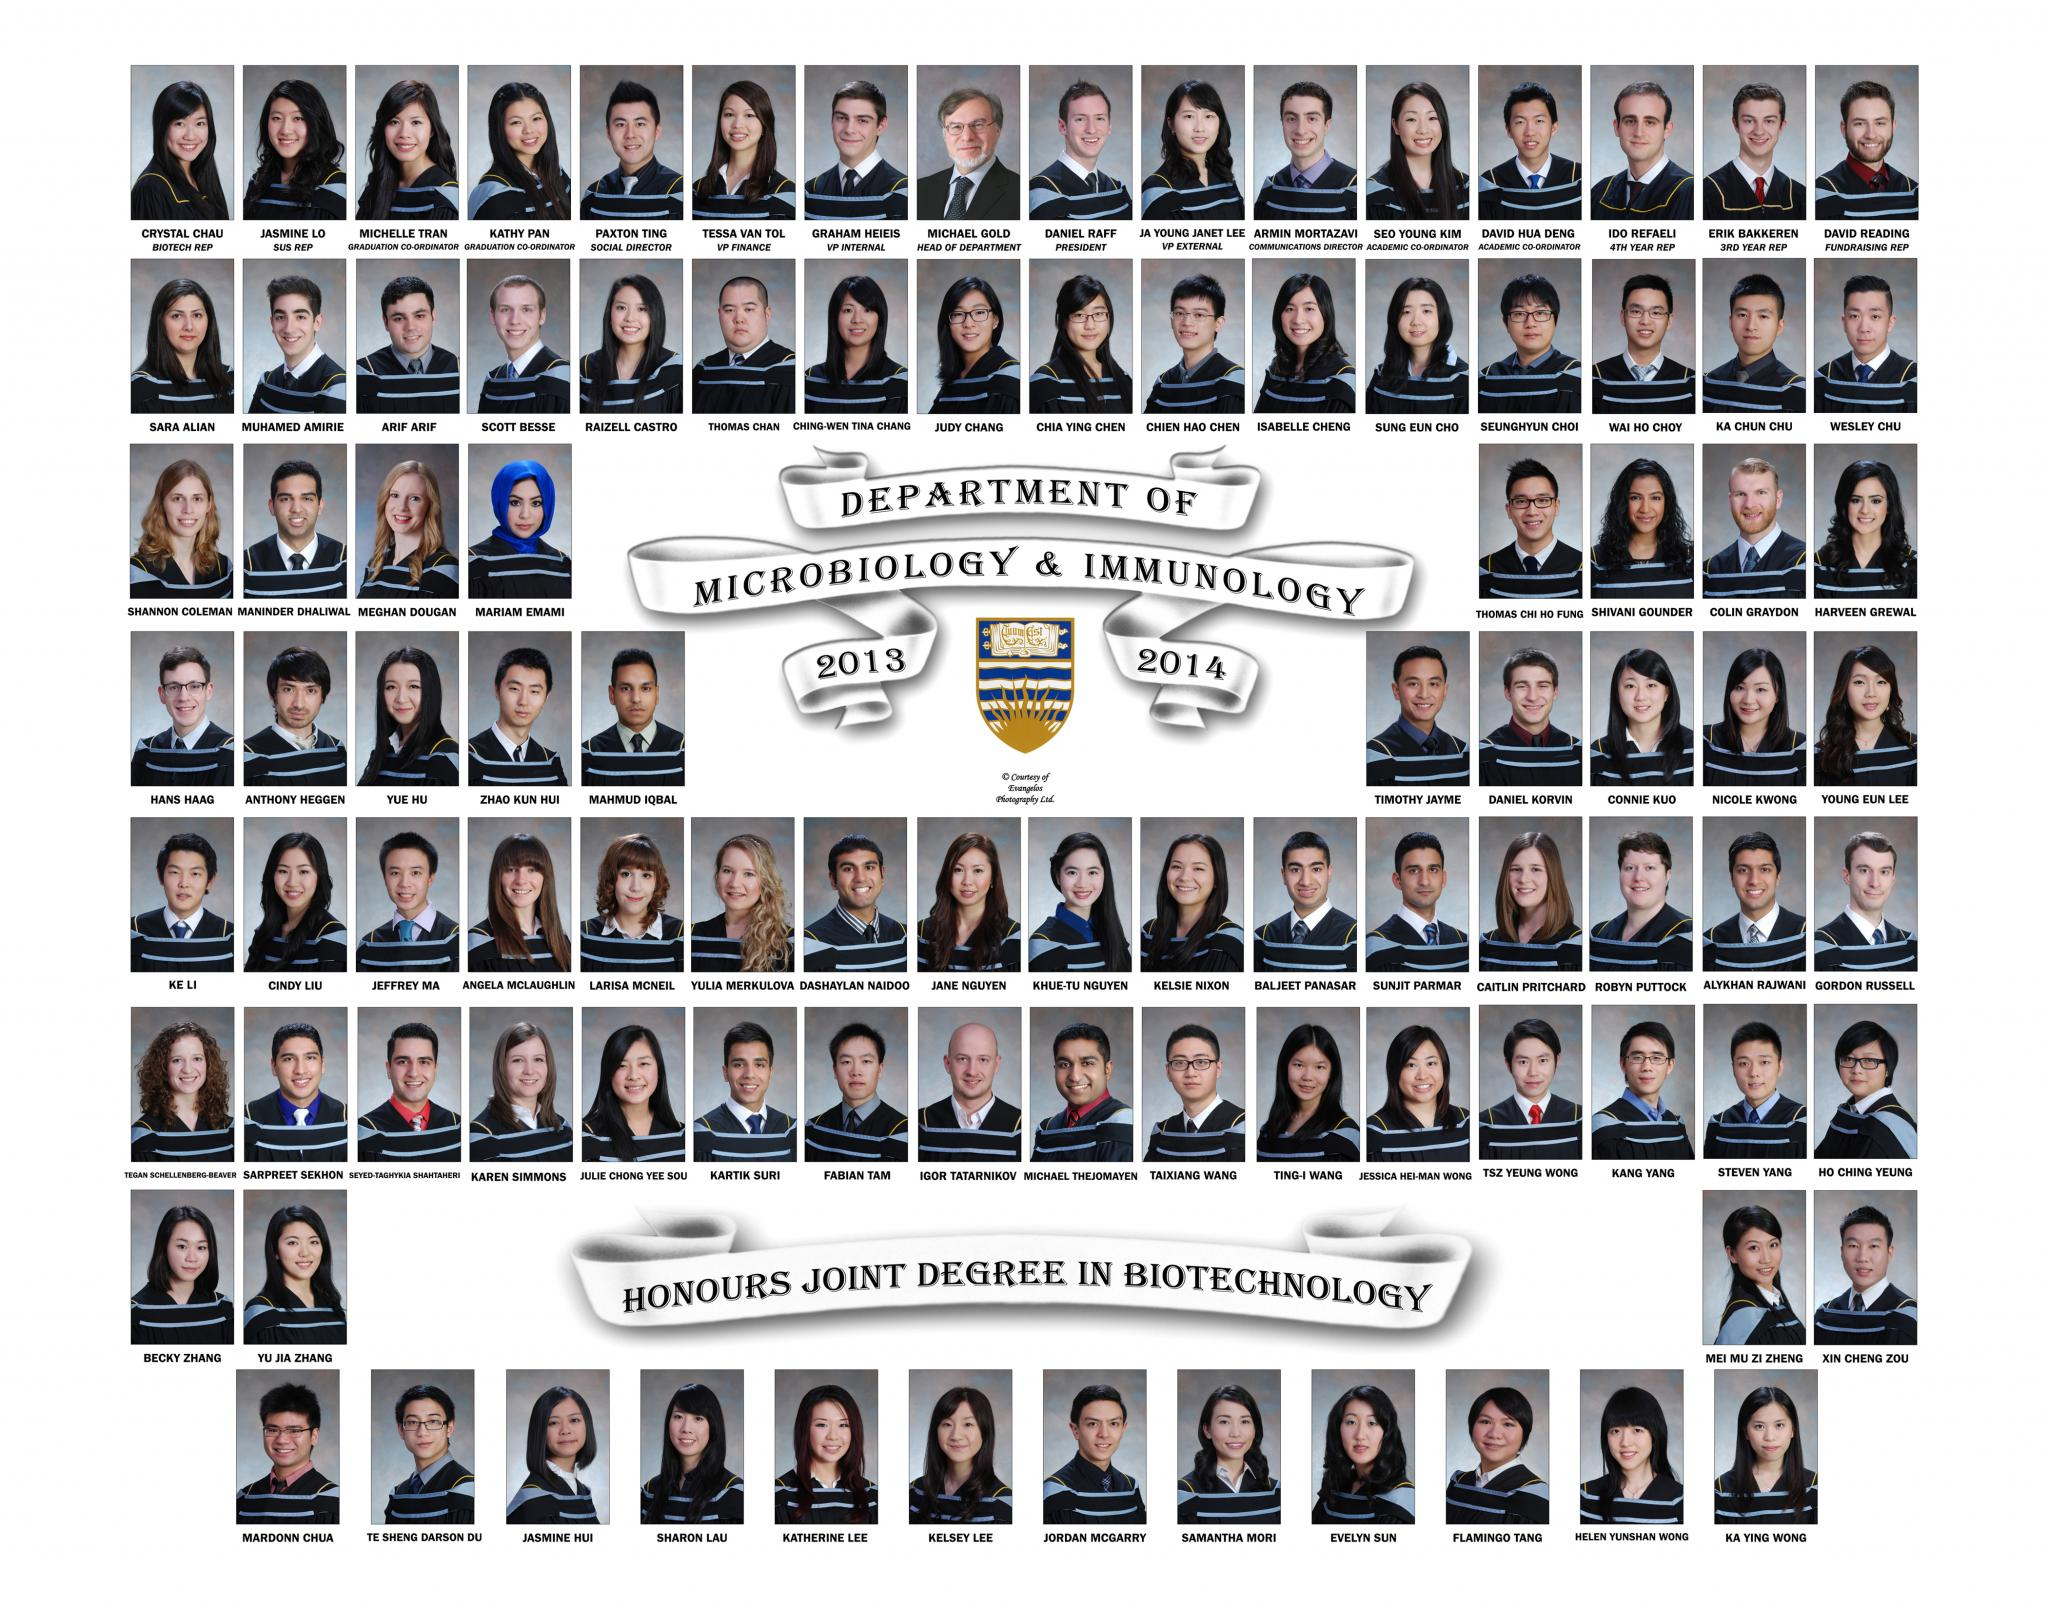 Graduating Class of 2013-2014